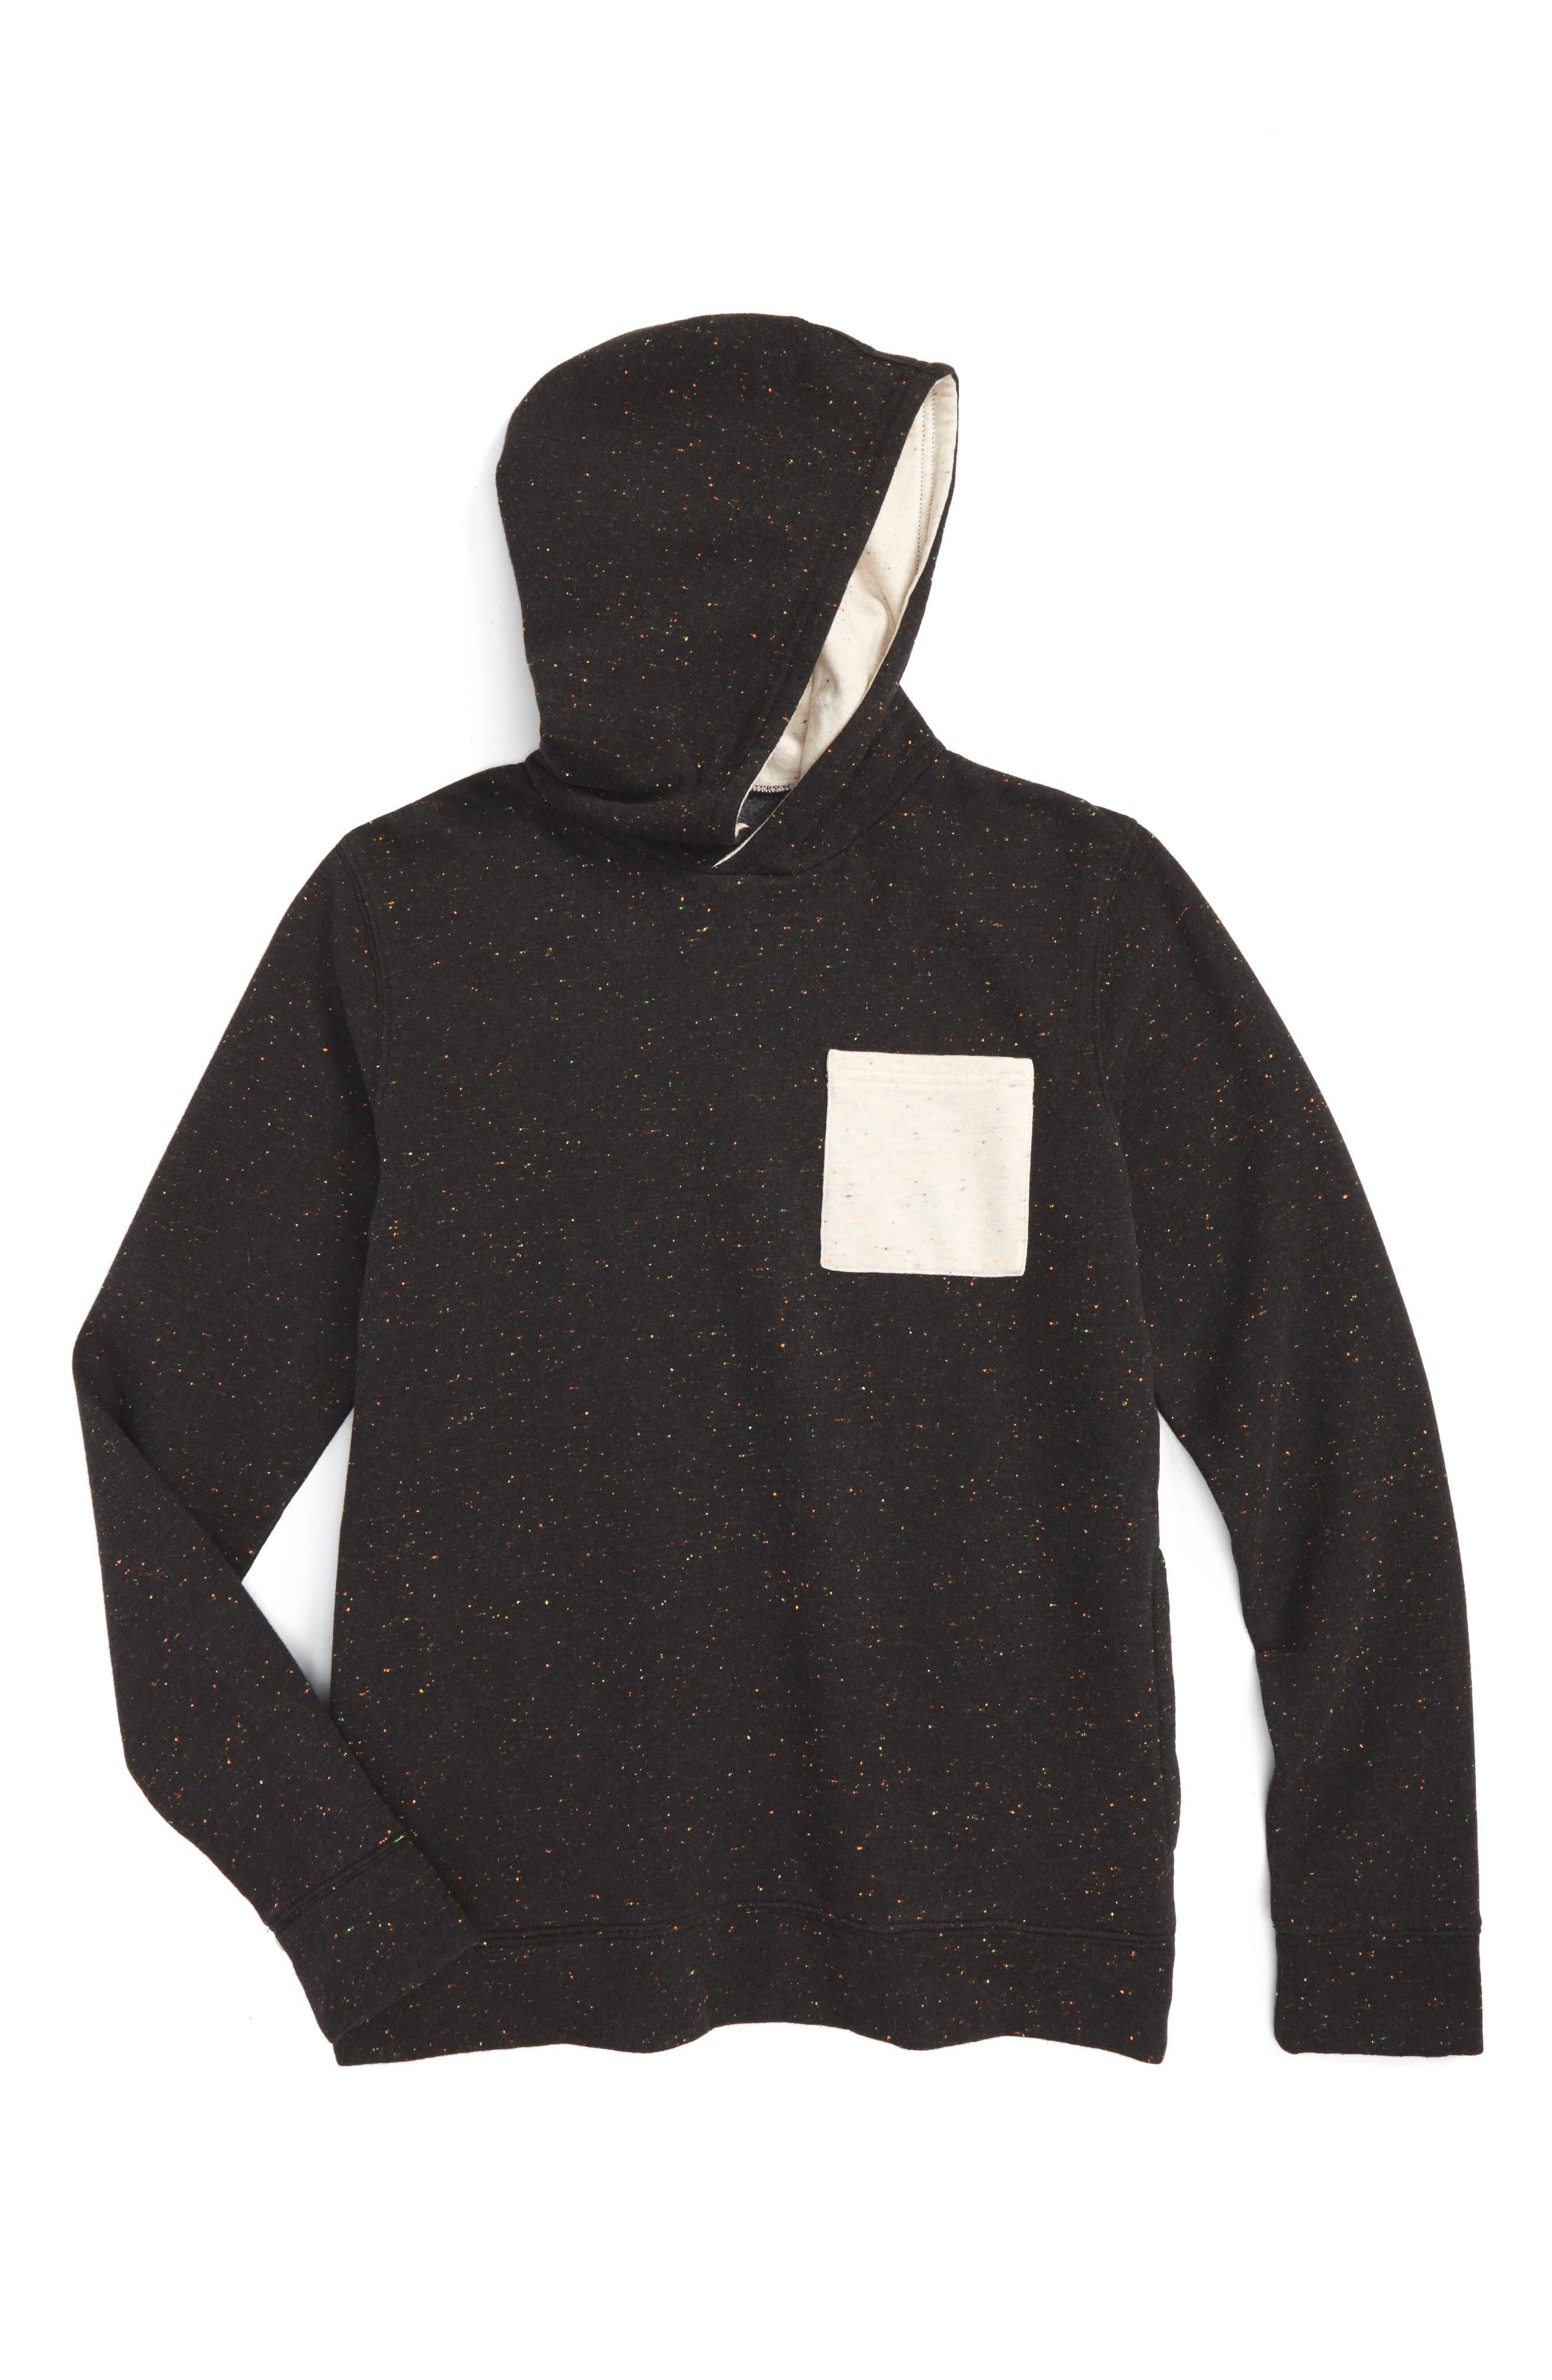 Nep Hoodie,                         Main,                         color, Black Multi Neps